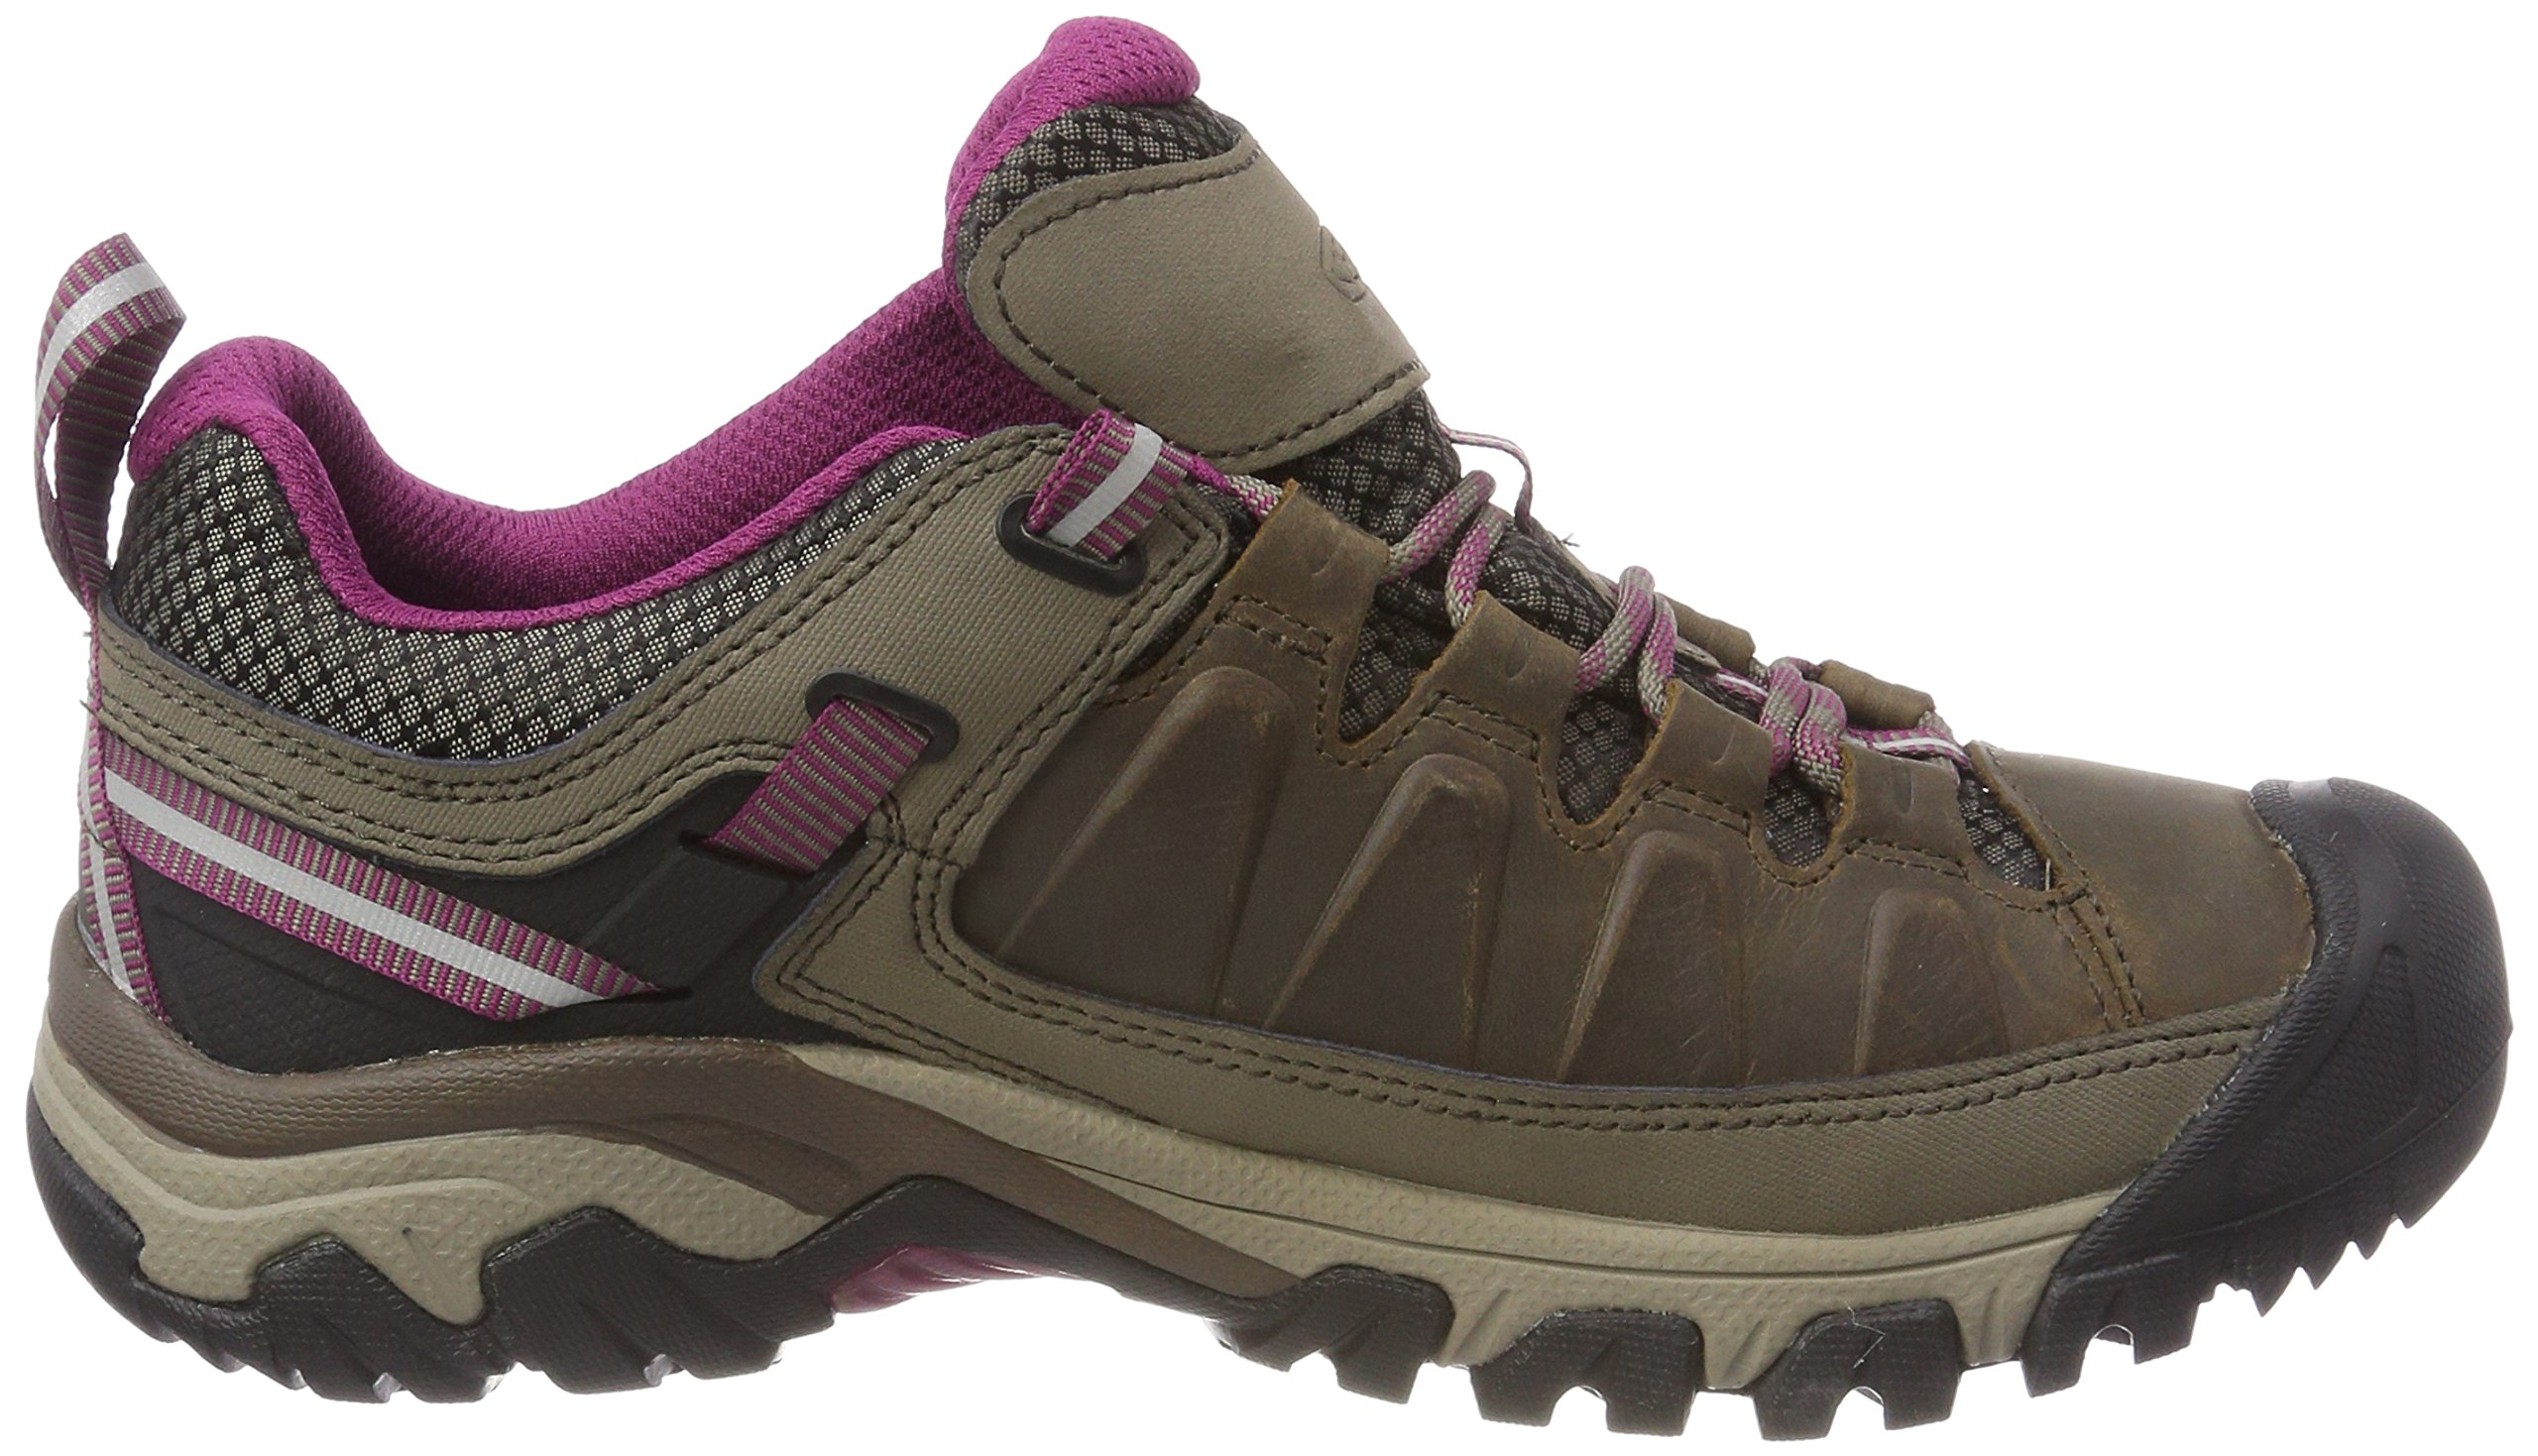 81J3l8Ly6yL - KEEN Women's Targhee Iii Wp Low Rise Hiking Shoes, 9